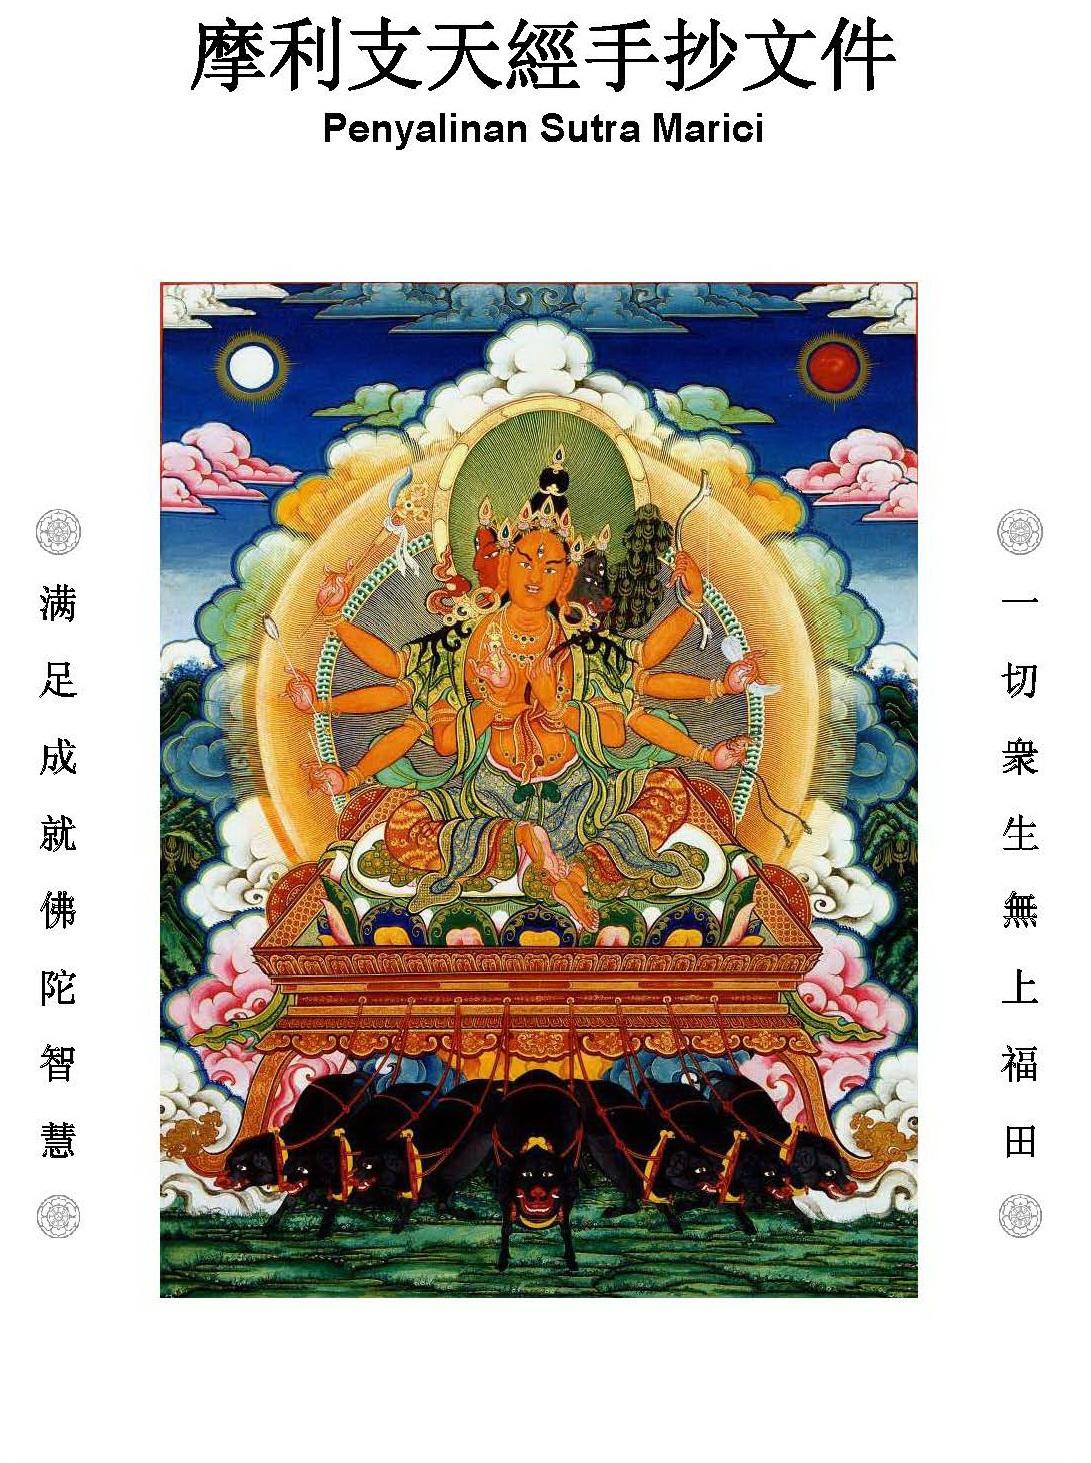 Penyalinan Sutra Marici Bodhisattva Versi Kedua